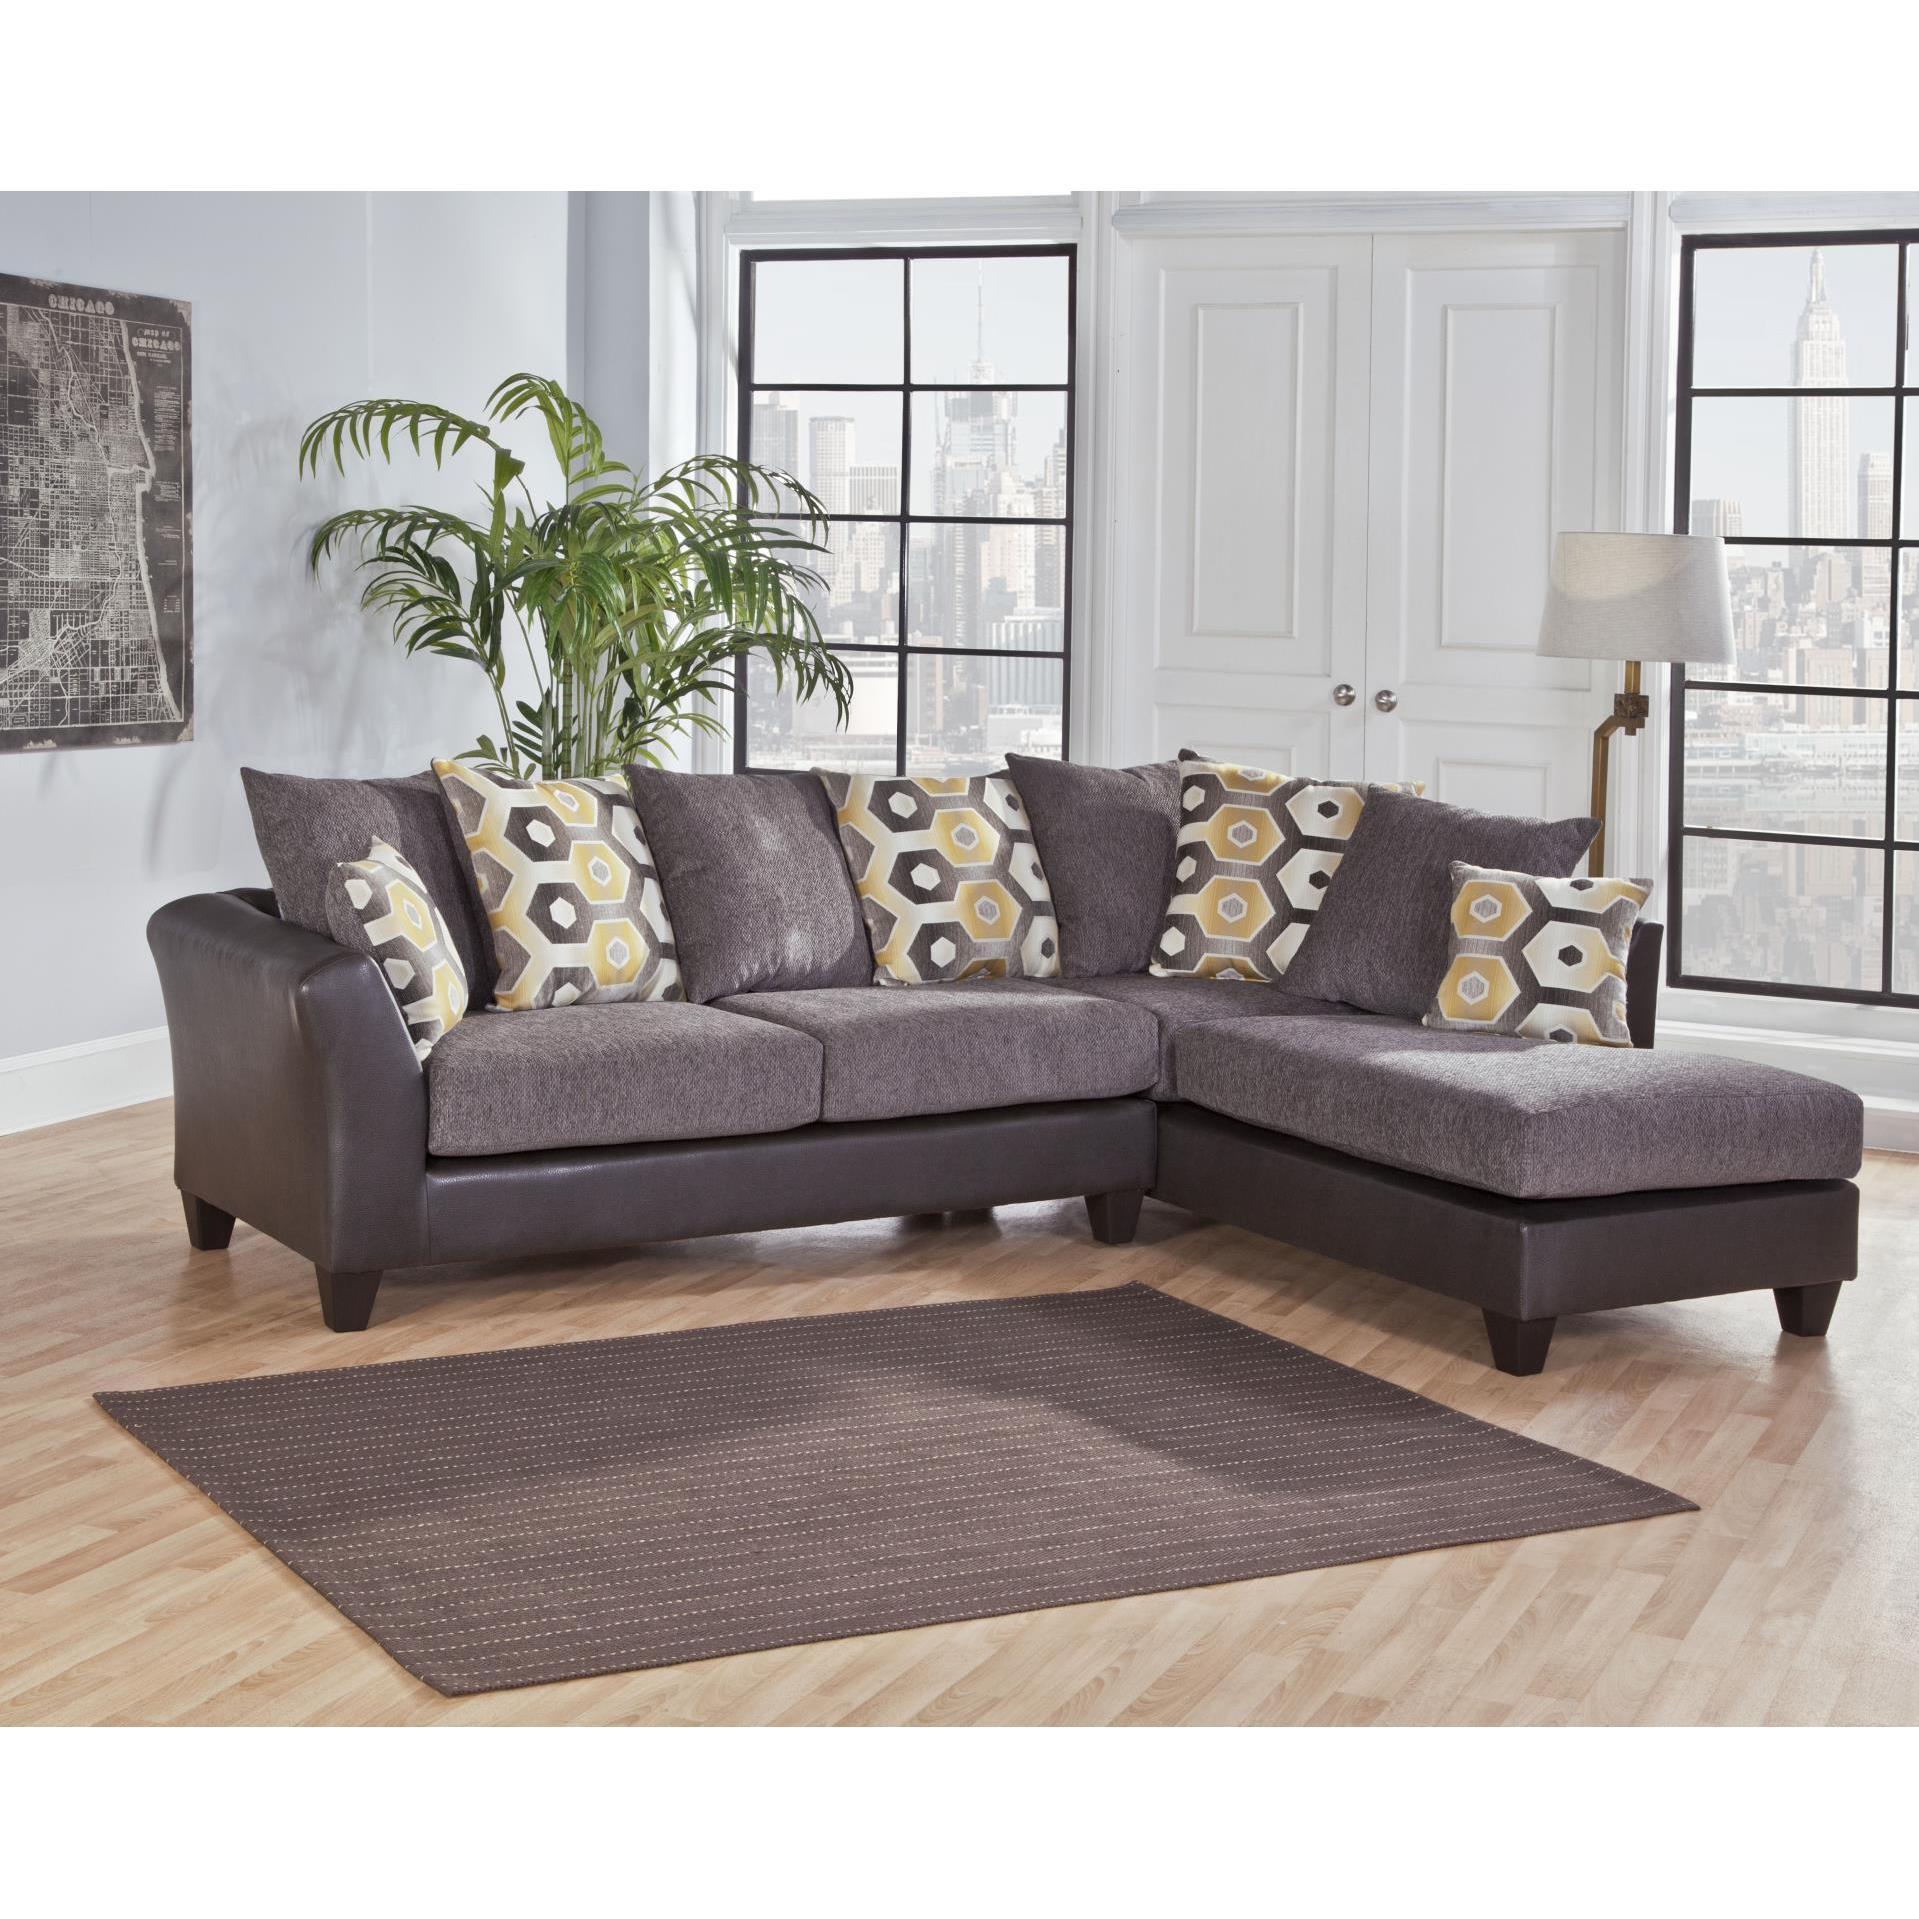 Sofa Trendz Danny Grey Two Tone Sectional (Danny Grey Two...